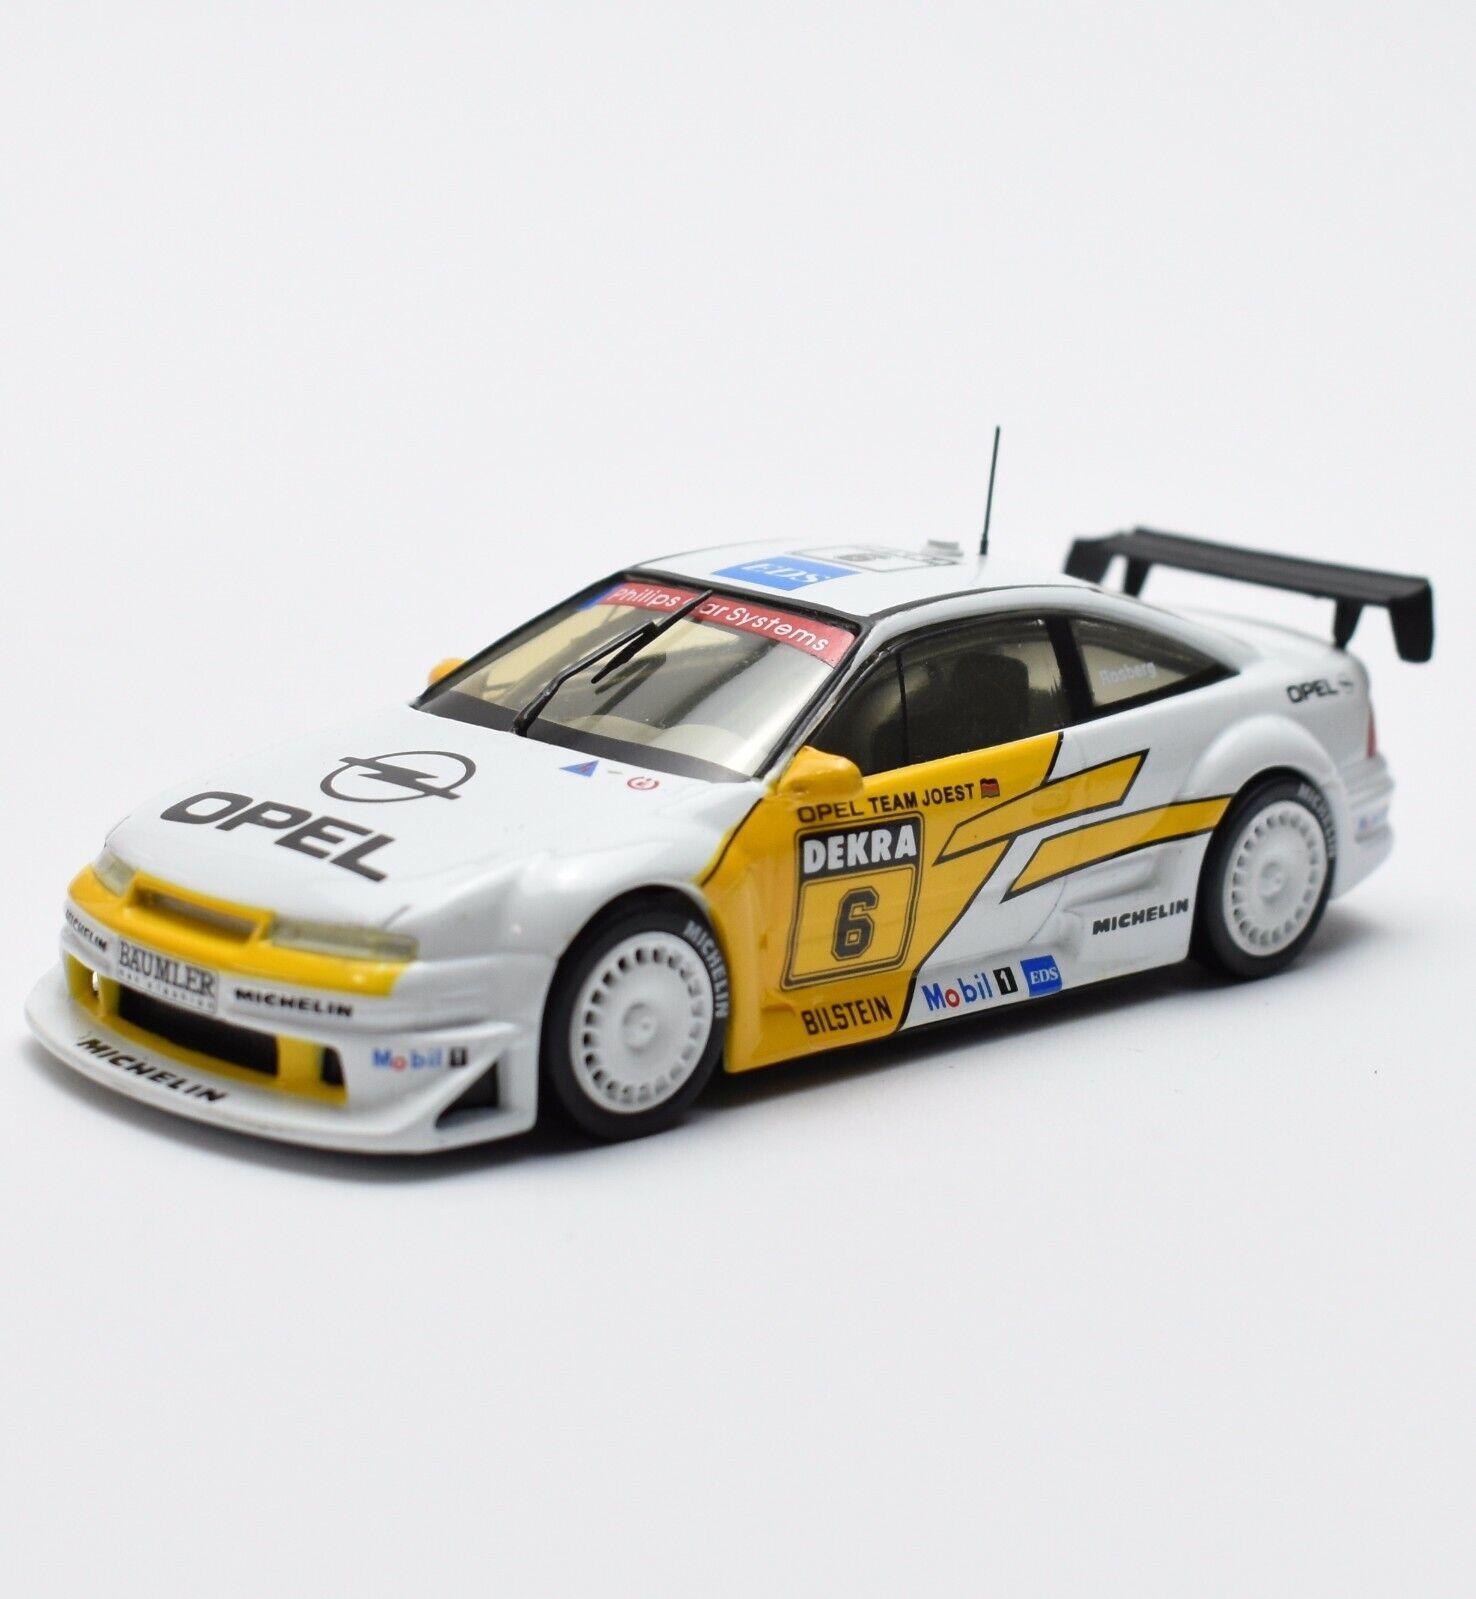 Minichamps Opel Calibra V6 Rennwagen DTM 1993 Rosberg, 1 43 , OVP, B322  | Sorgfältig ausgewählte Materialien